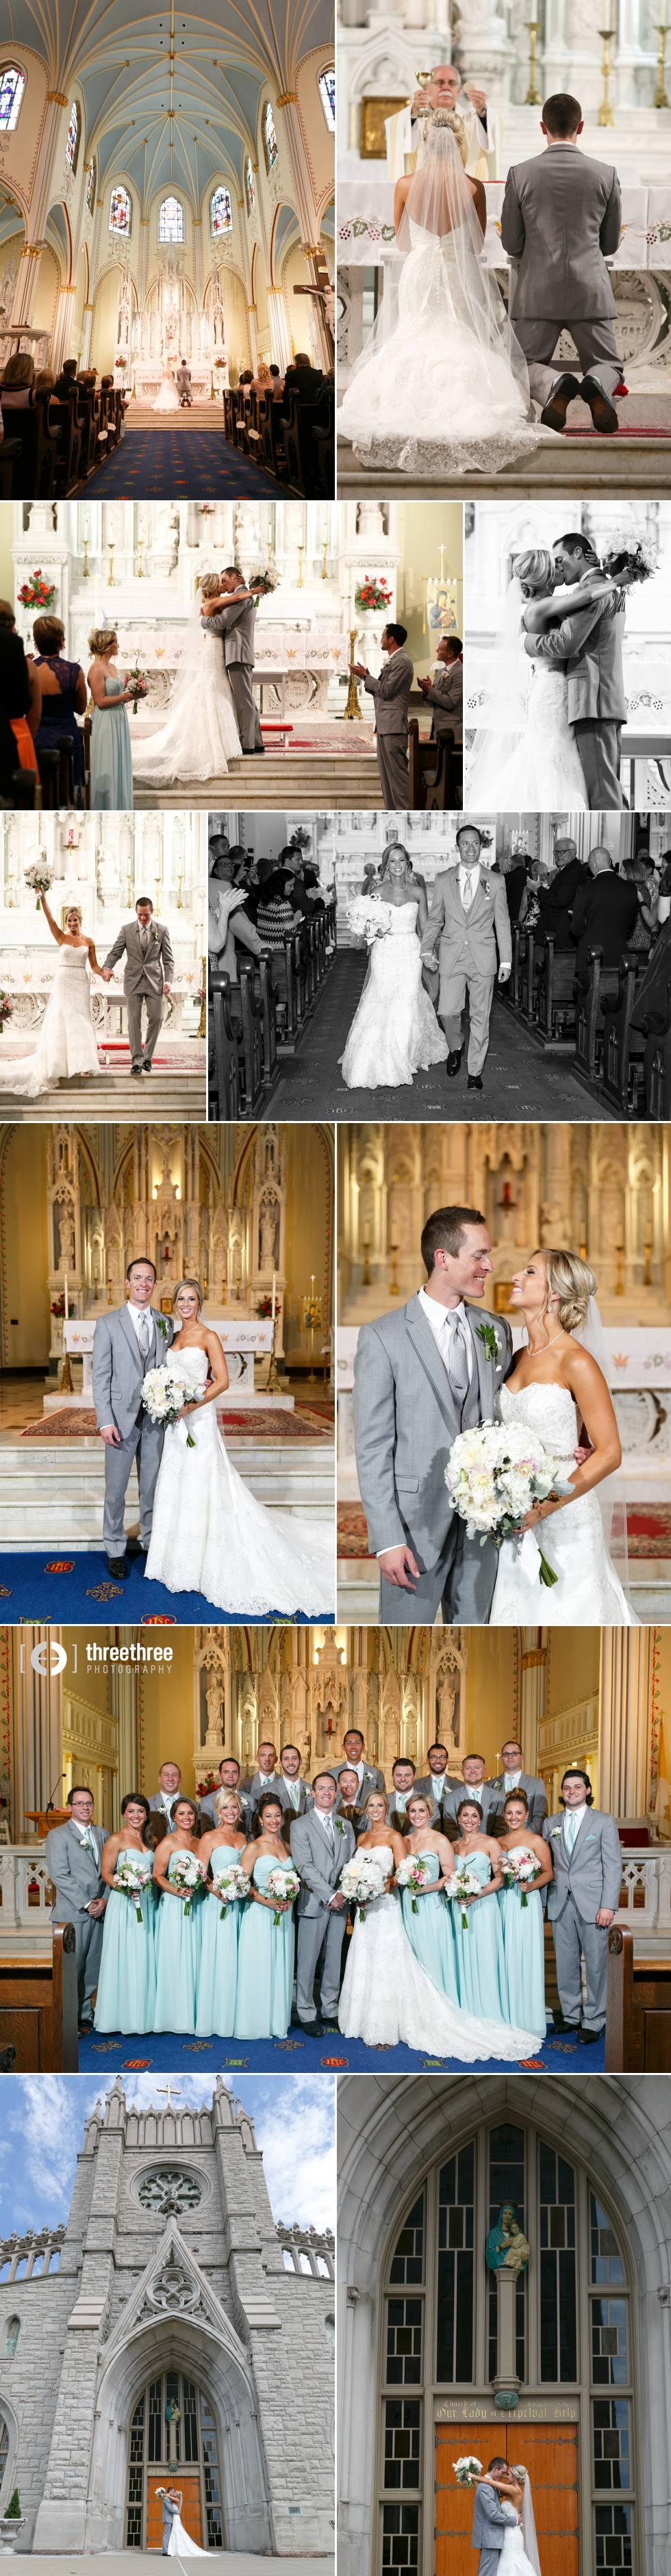 Natalie_AJ_wedding 6